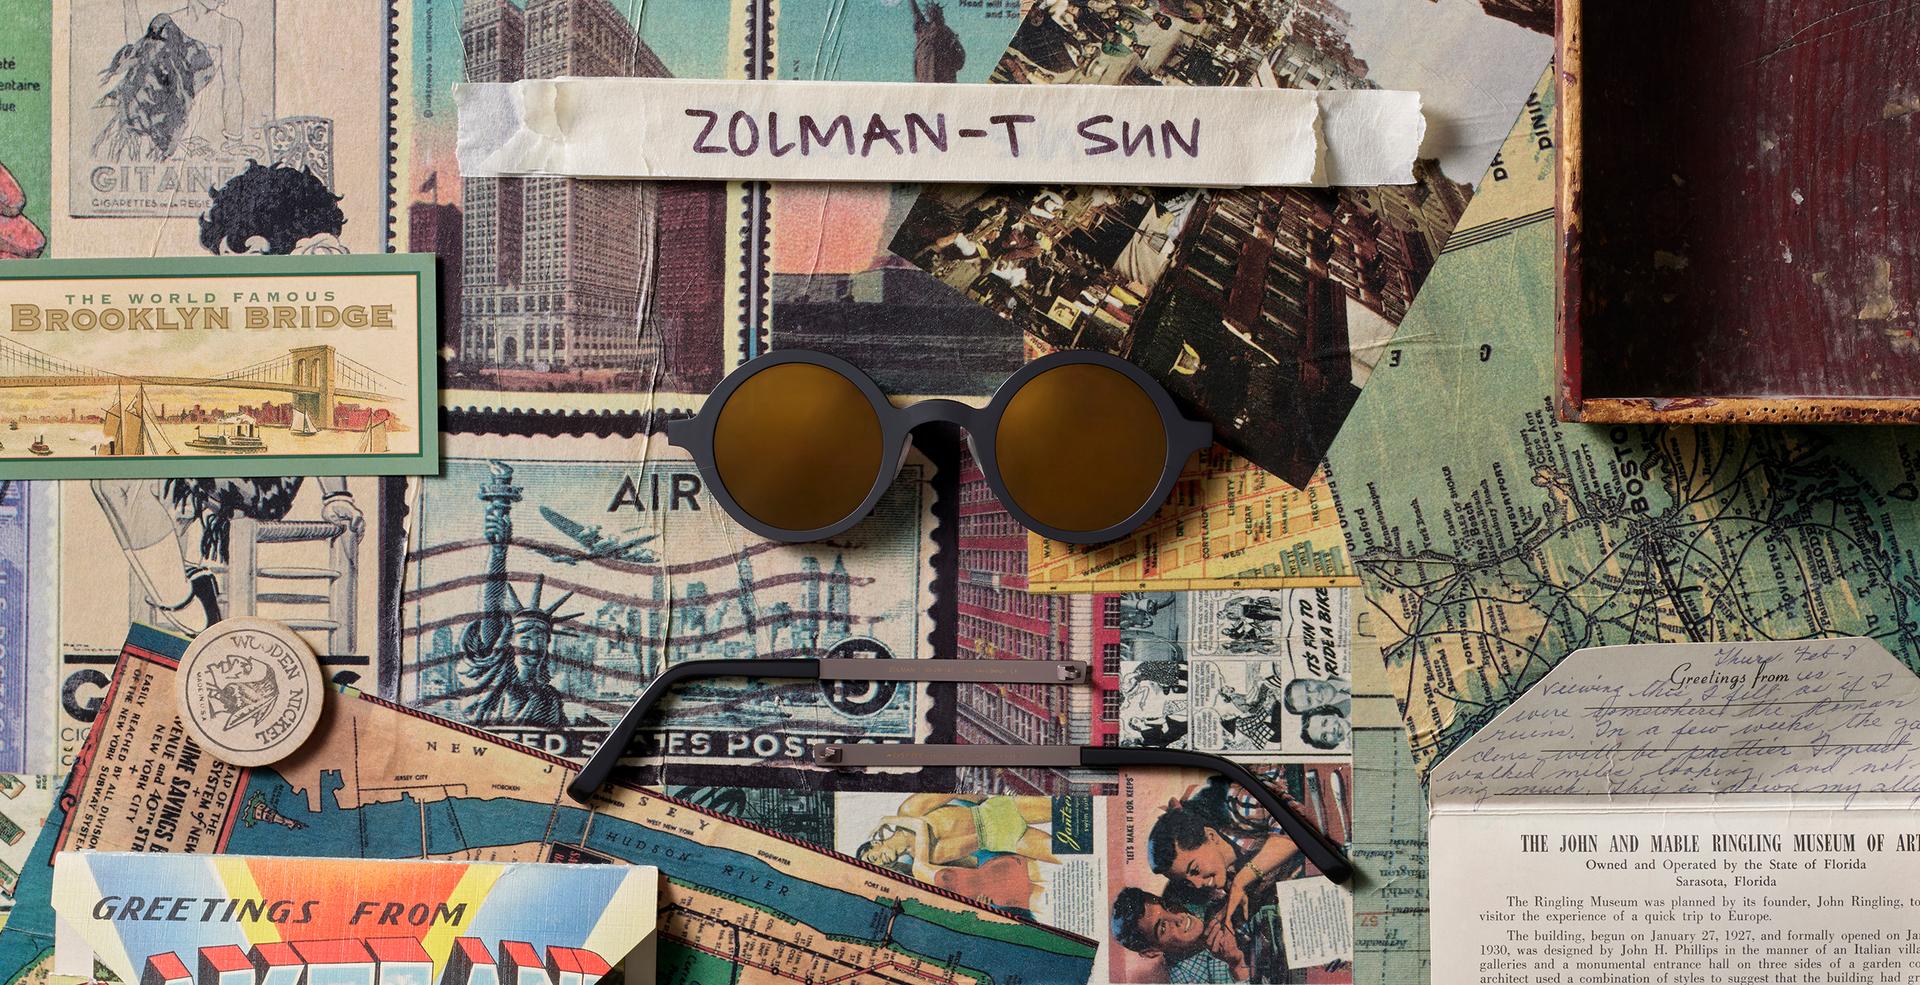 ZOLMAN-T SUN